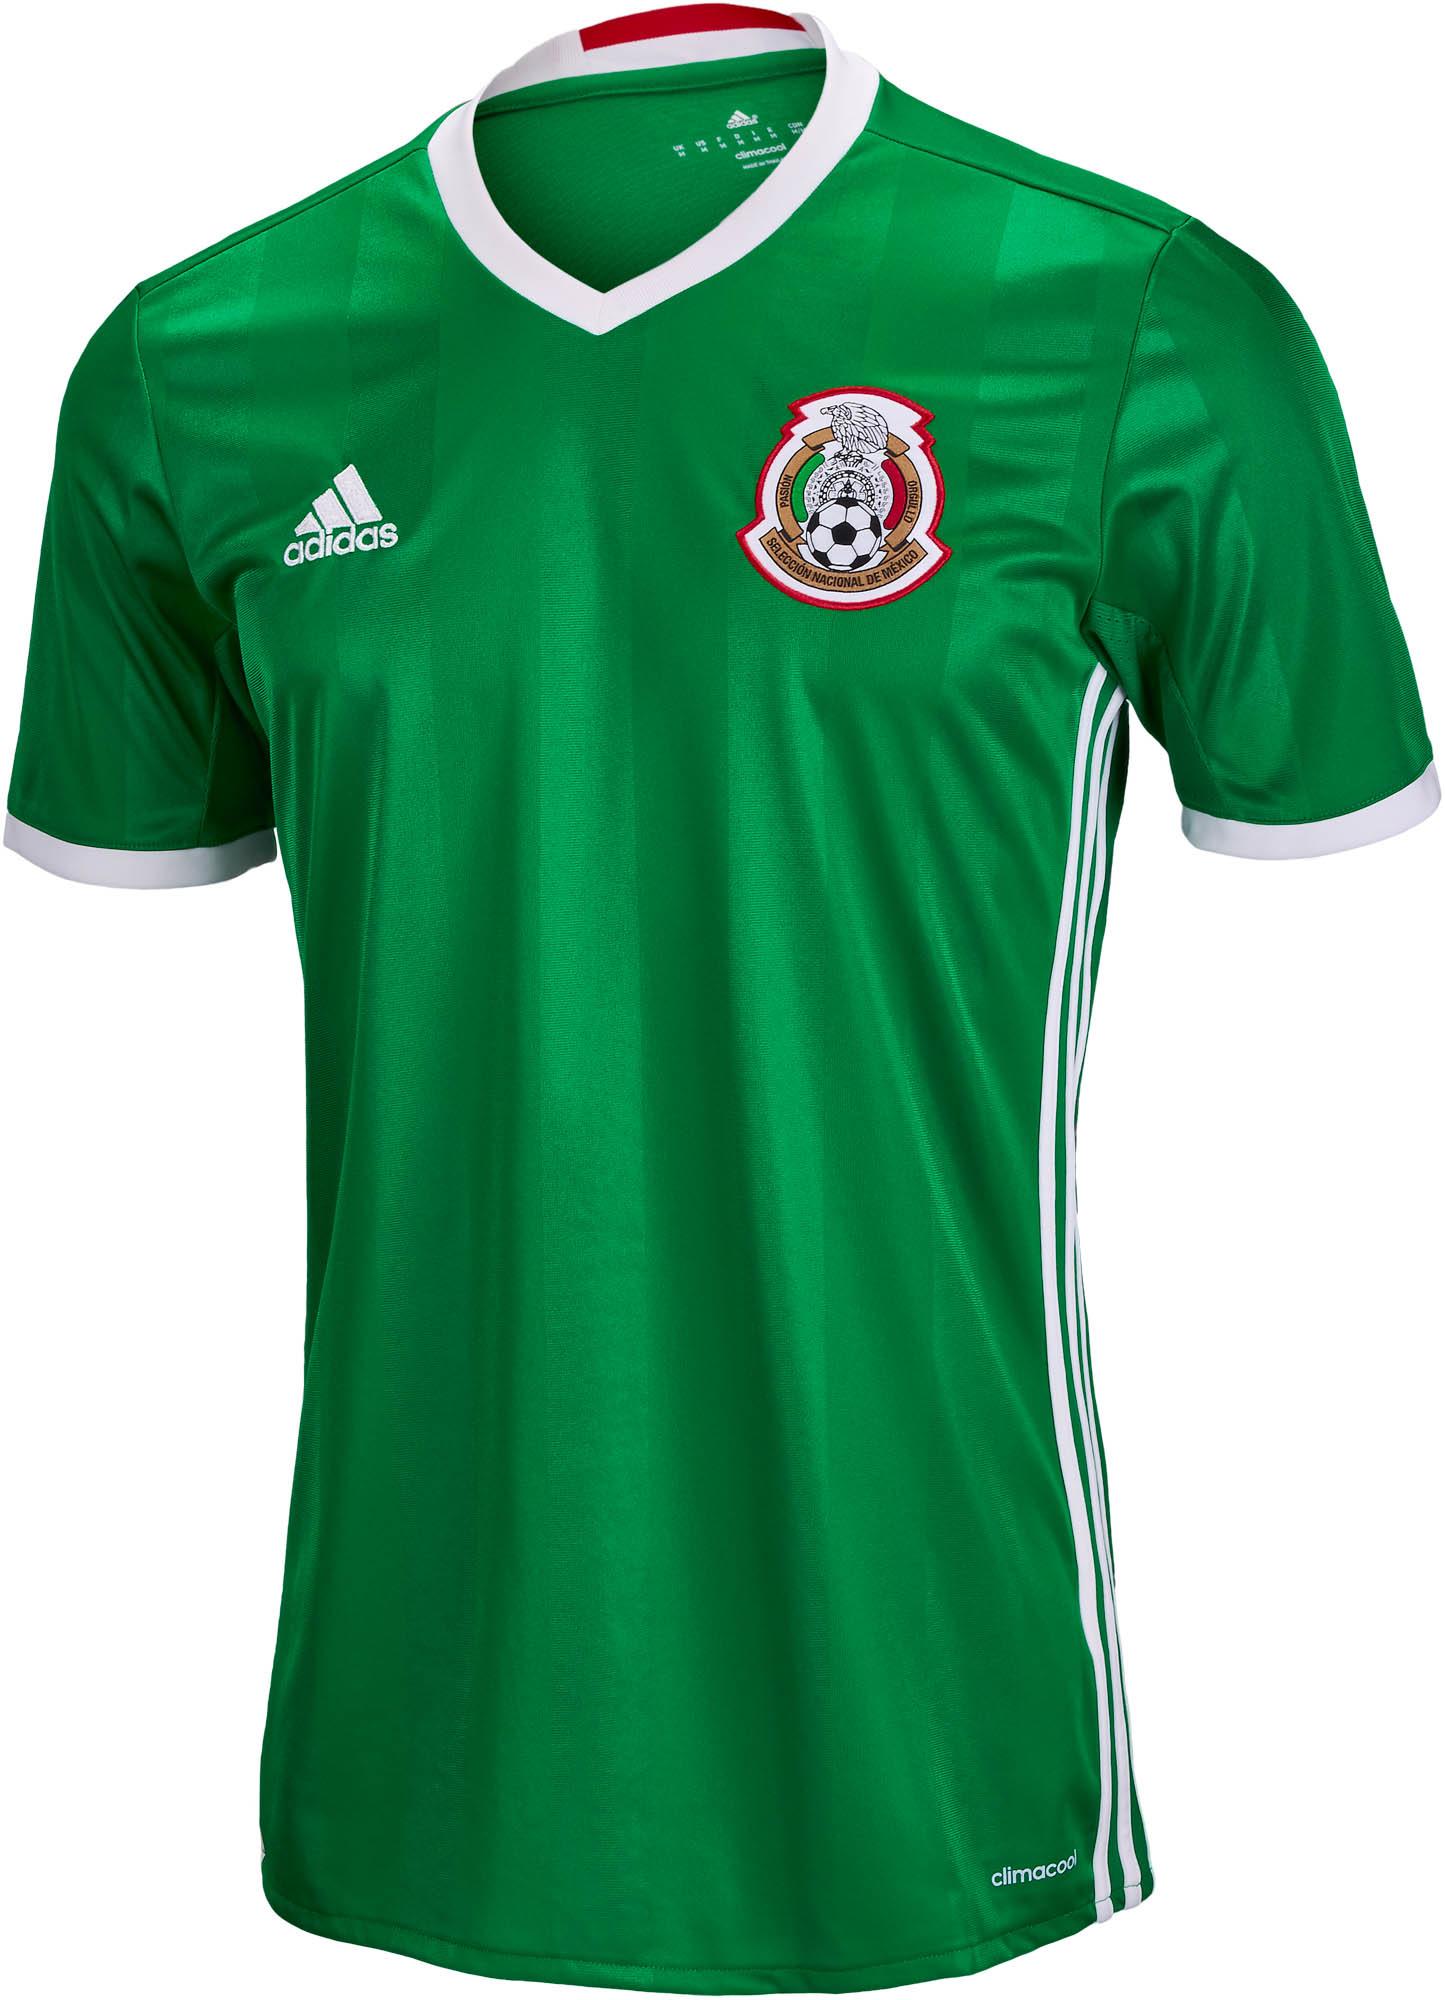 adidas Mexico Home Jersey 2016-17 - Soccer Master